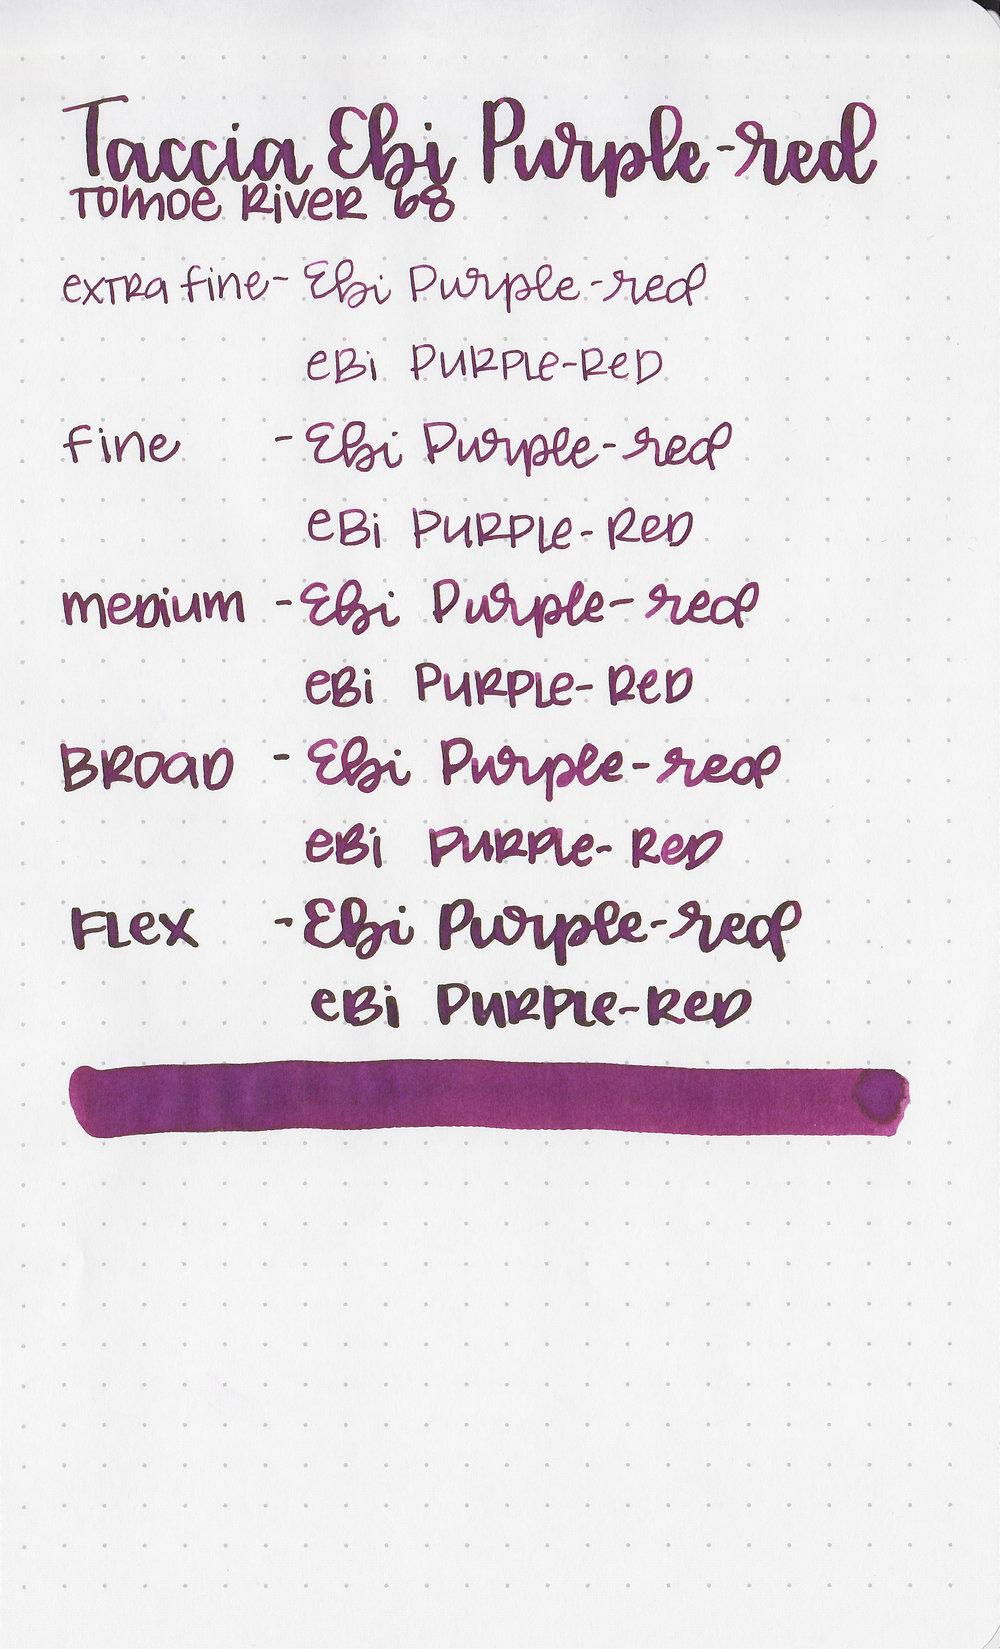 tac-ebi-purple-red-11.jpg